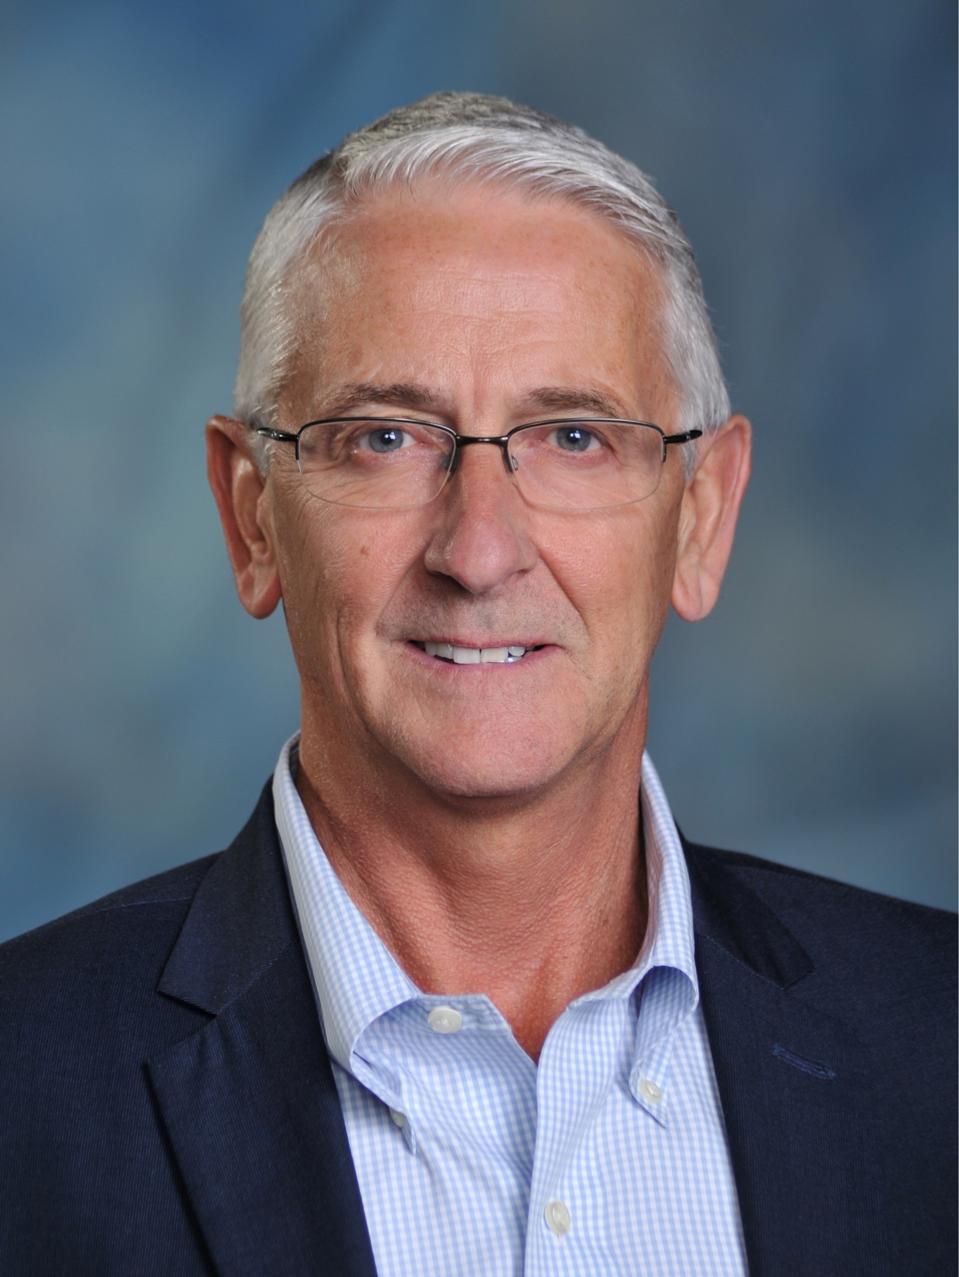 Dorman Bazell, CDO of State of North Dakota